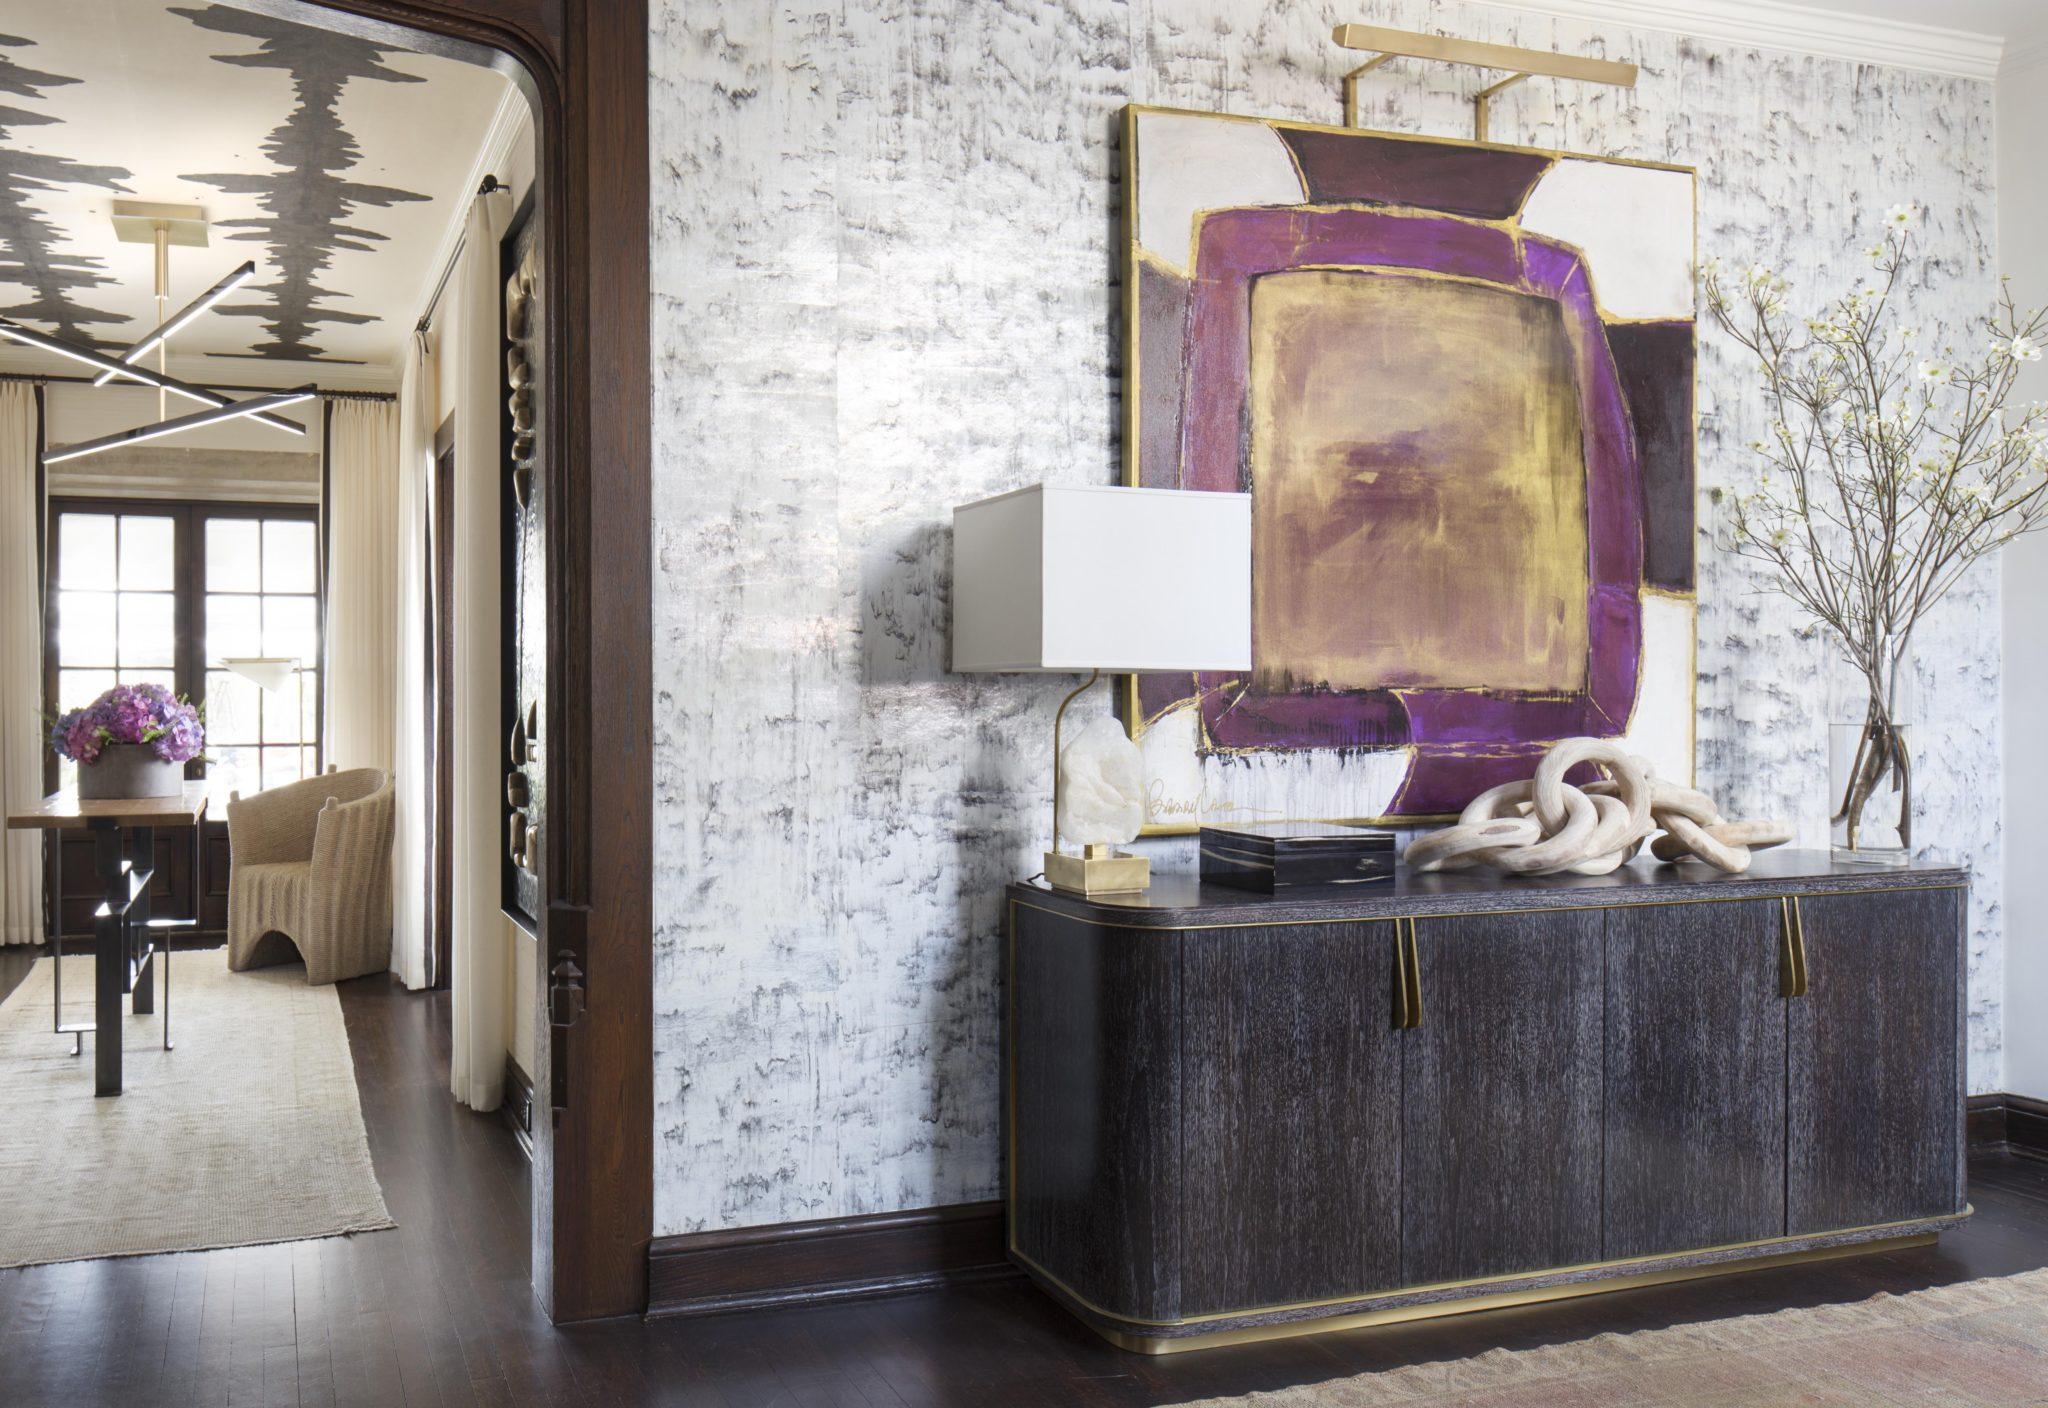 Entry and gallery by Elizabeth Krueger Design